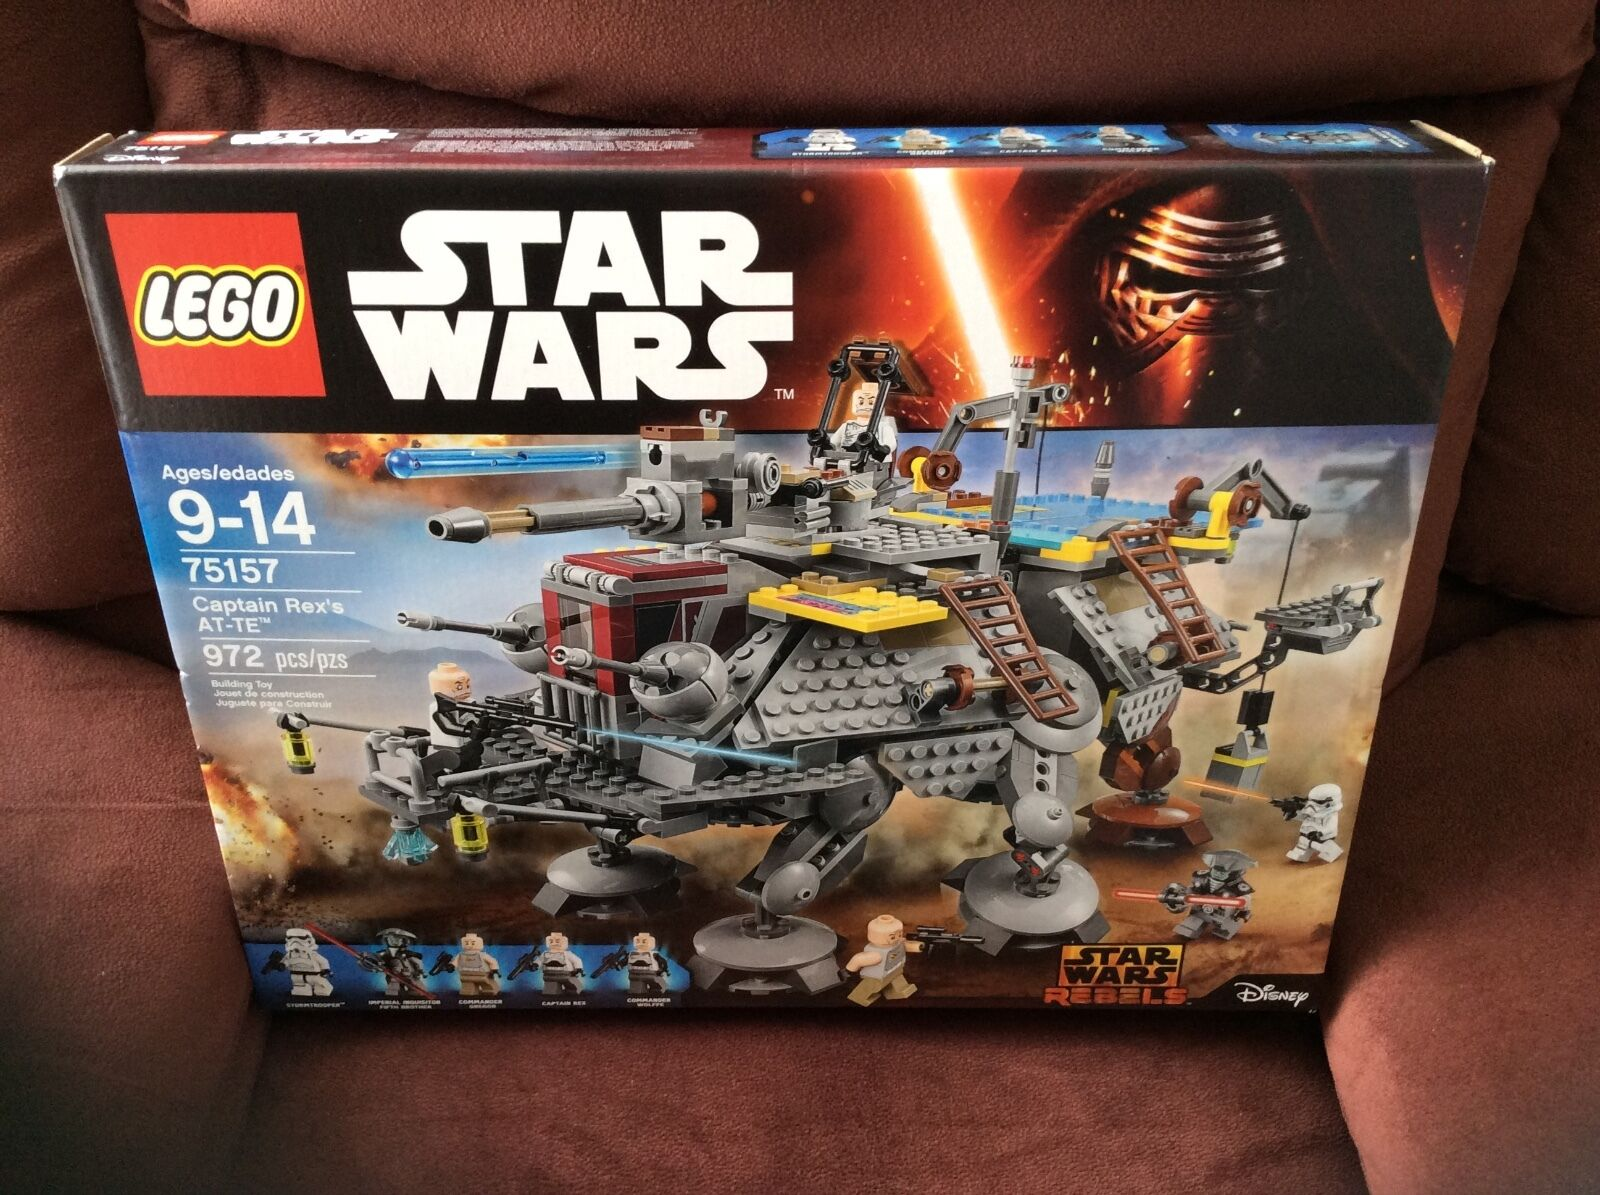 2016 2016 2016 LEGO STAR WARS CAPTAIN REX'S AT-TE (972) PIECES (5) MINI FIGURES NEW aee78e